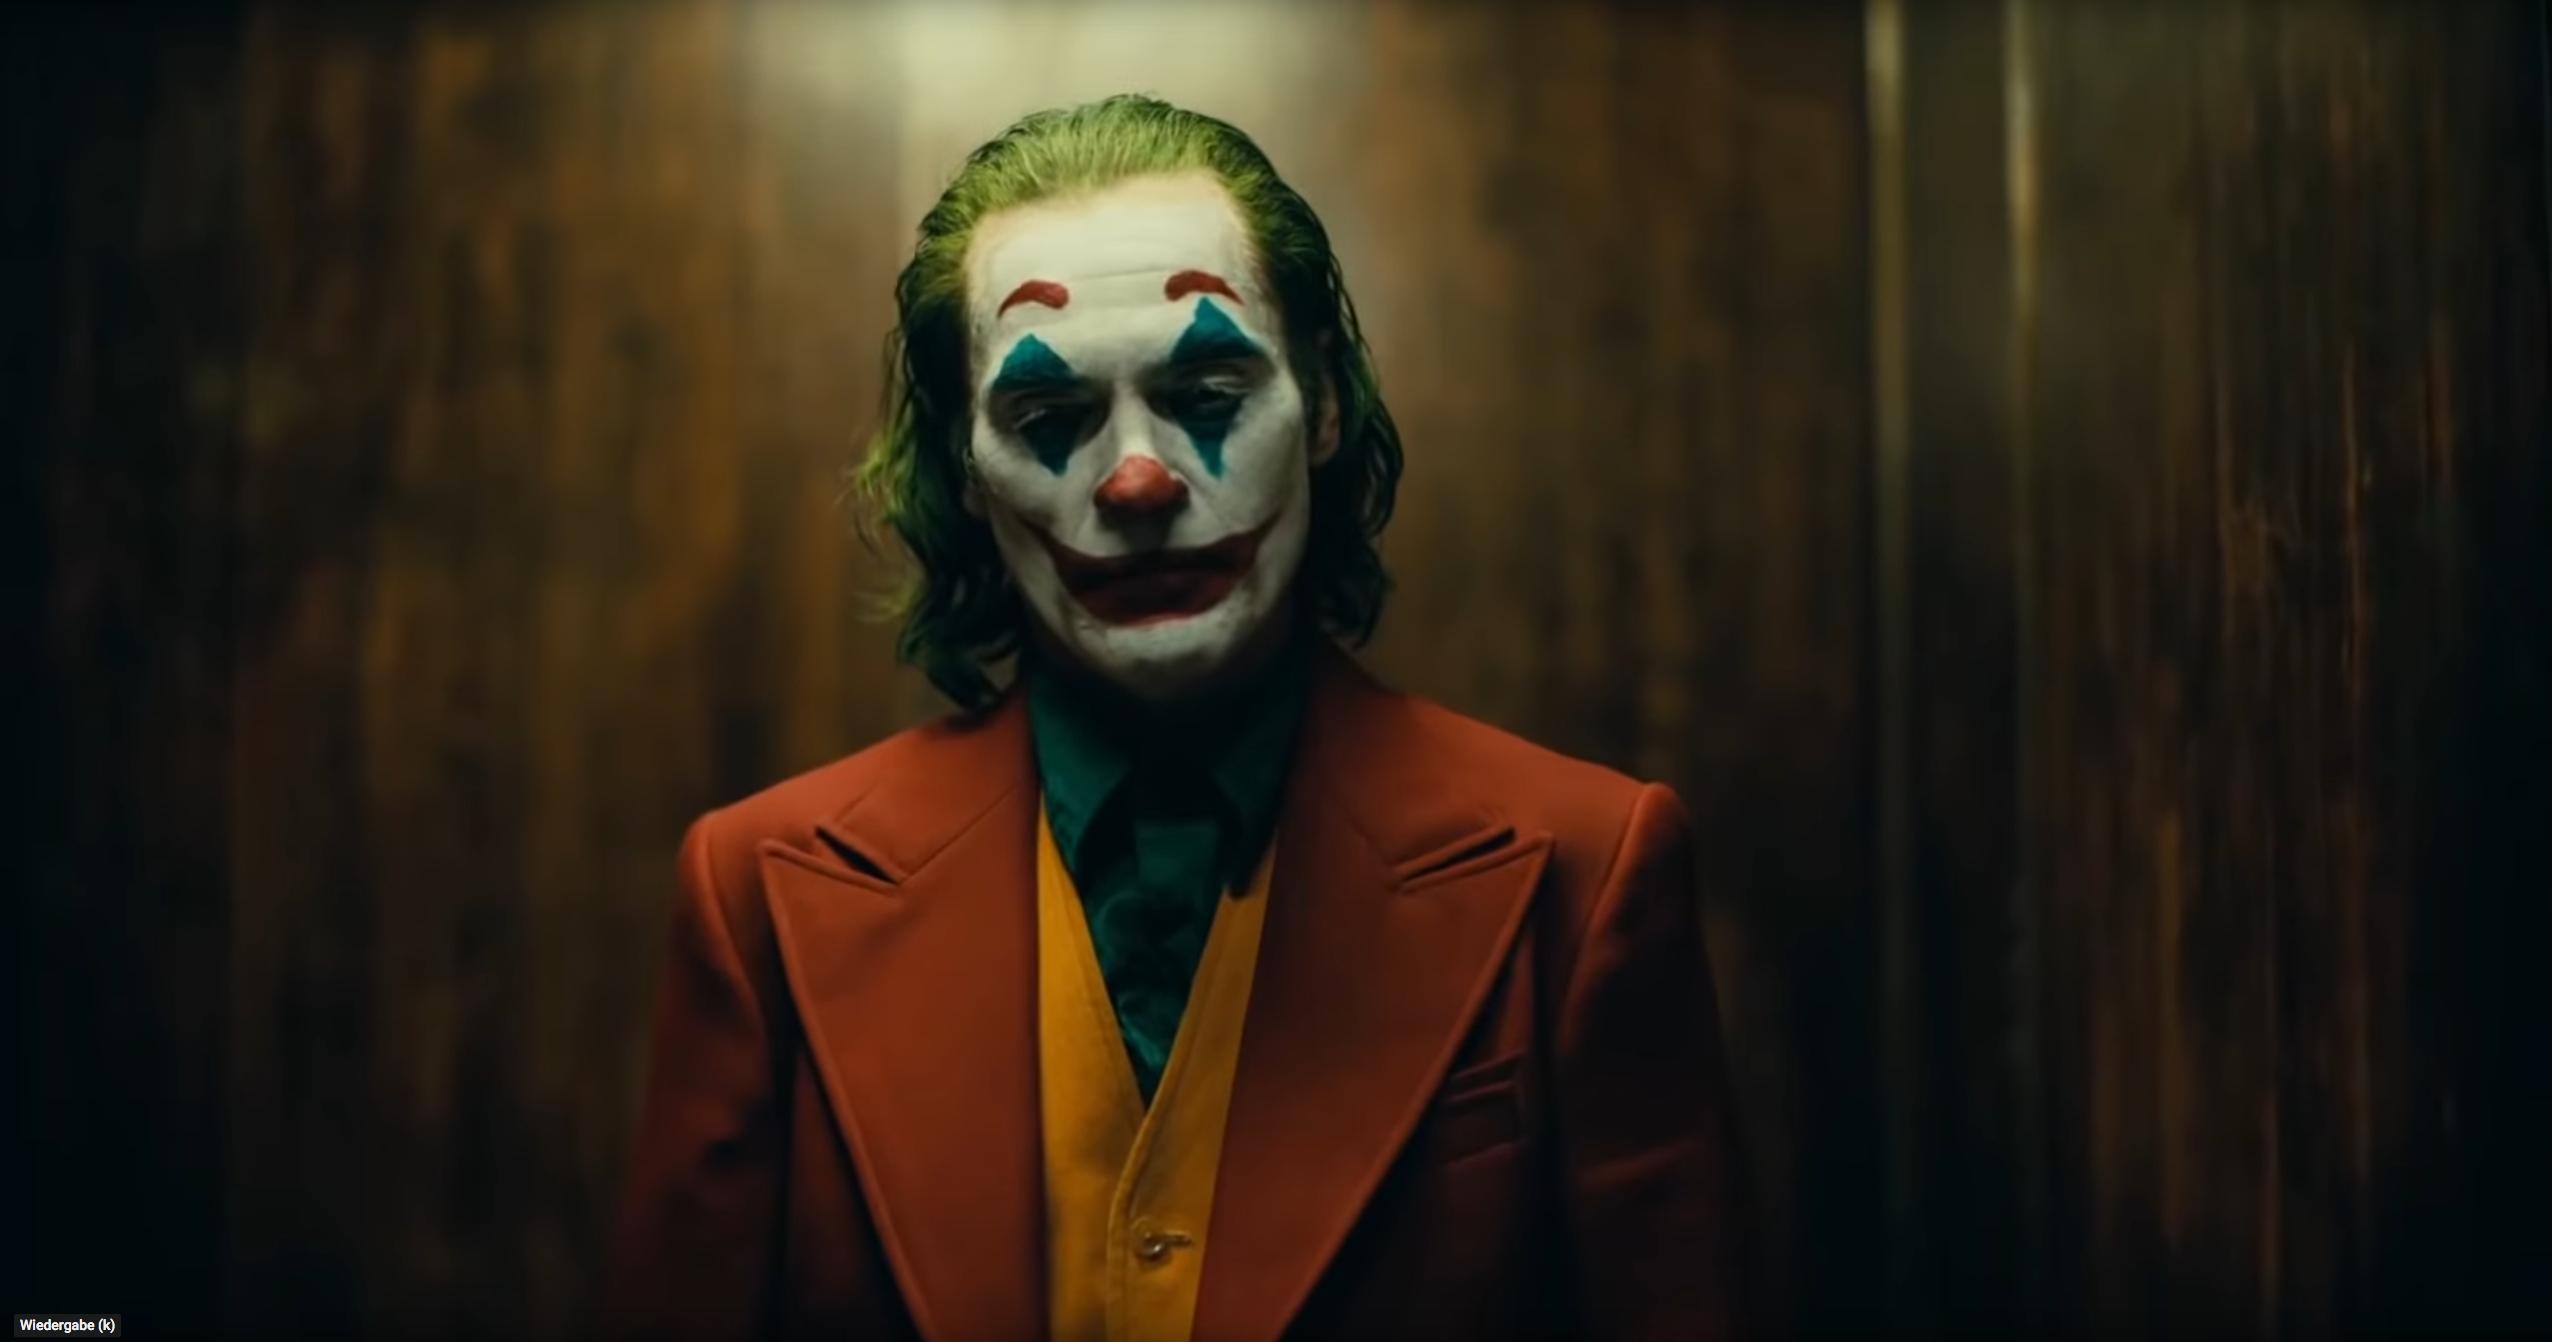 Pin Von Andy Klossner Auf Beautiful Portrait Shots In Movies Joker Joker Comic Der Joker